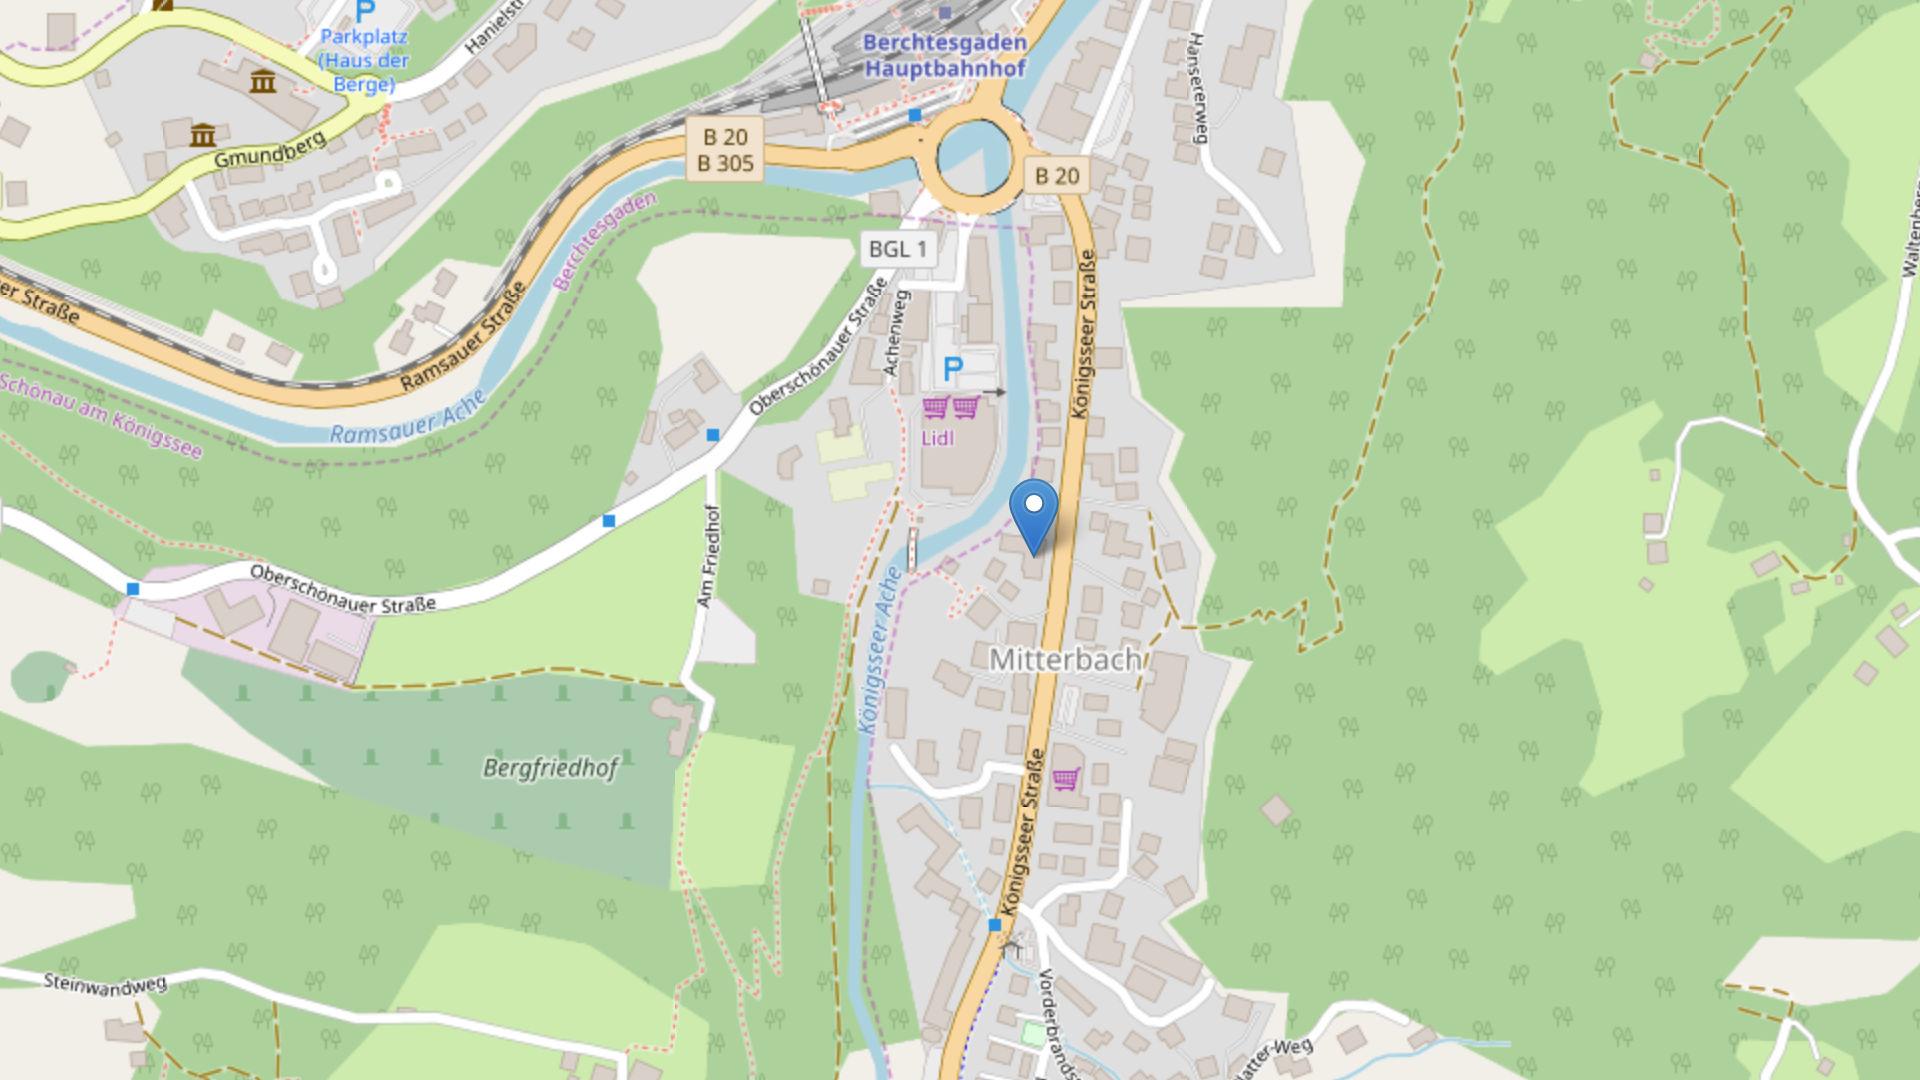 Kartenausschnitt von Openstreetmap